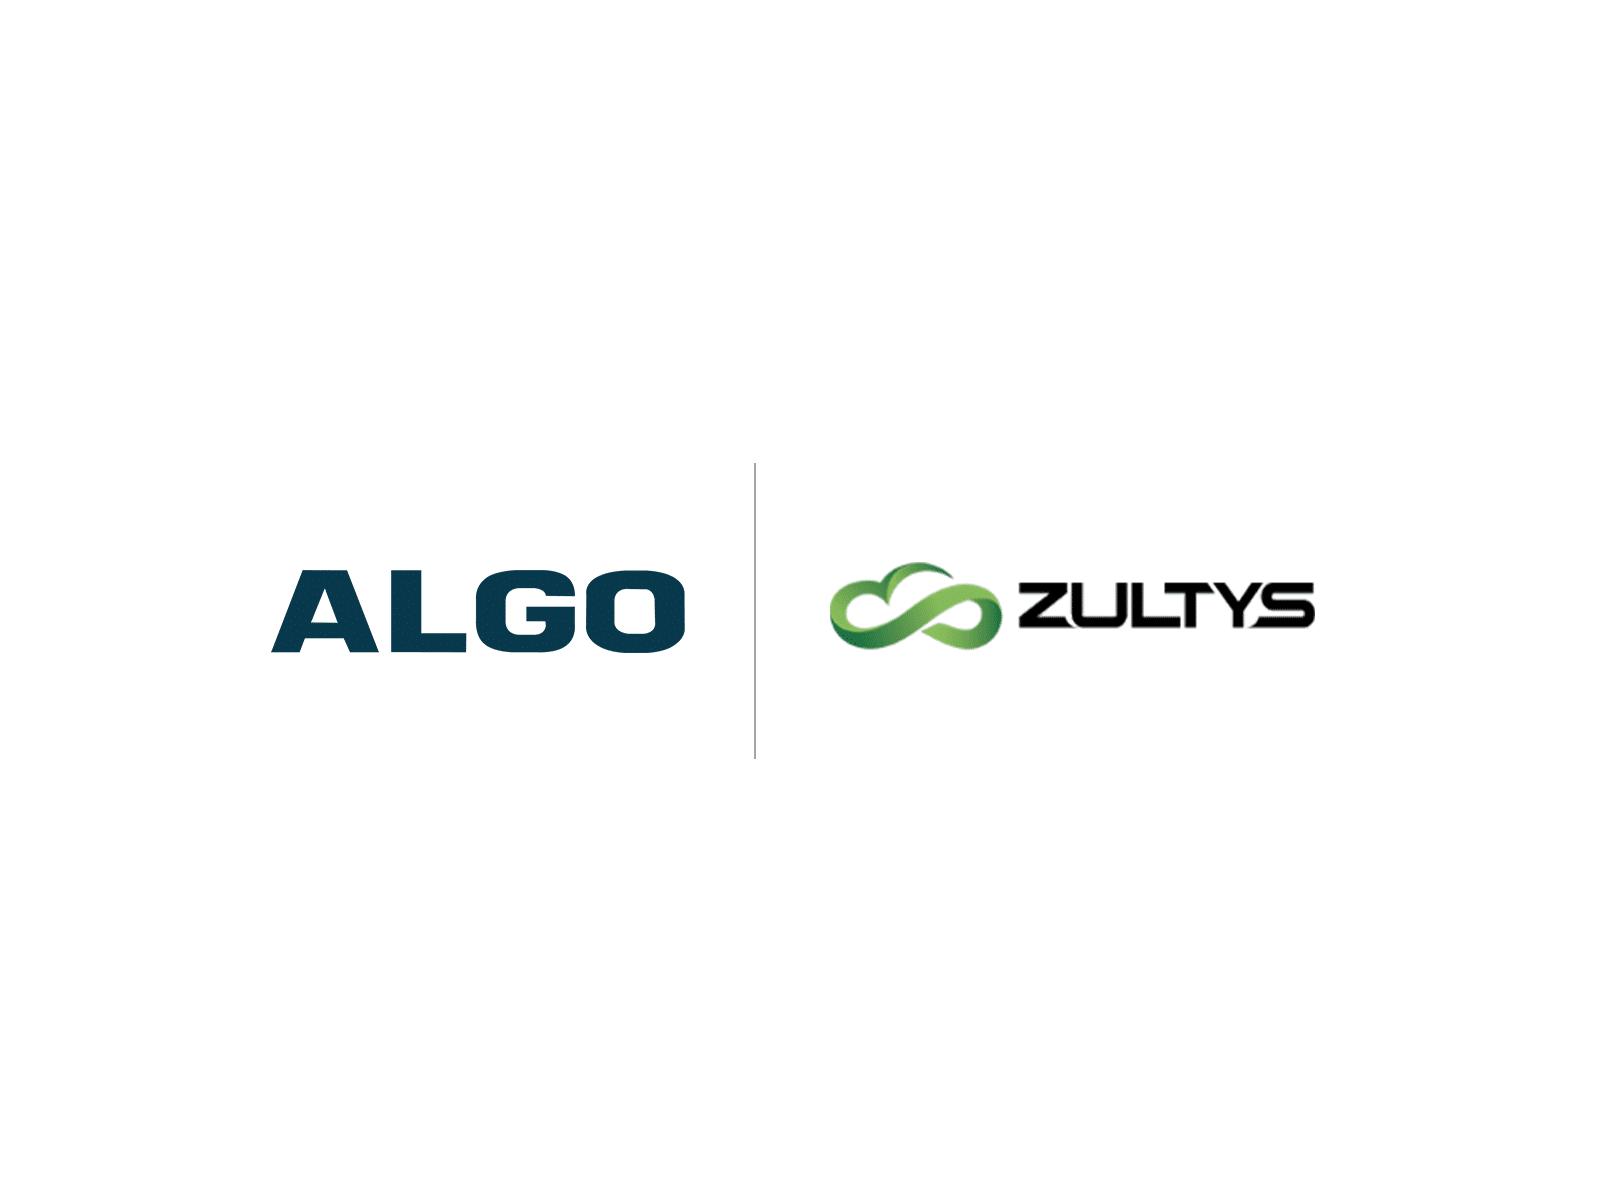 Algo Zultys Compatibility Logo